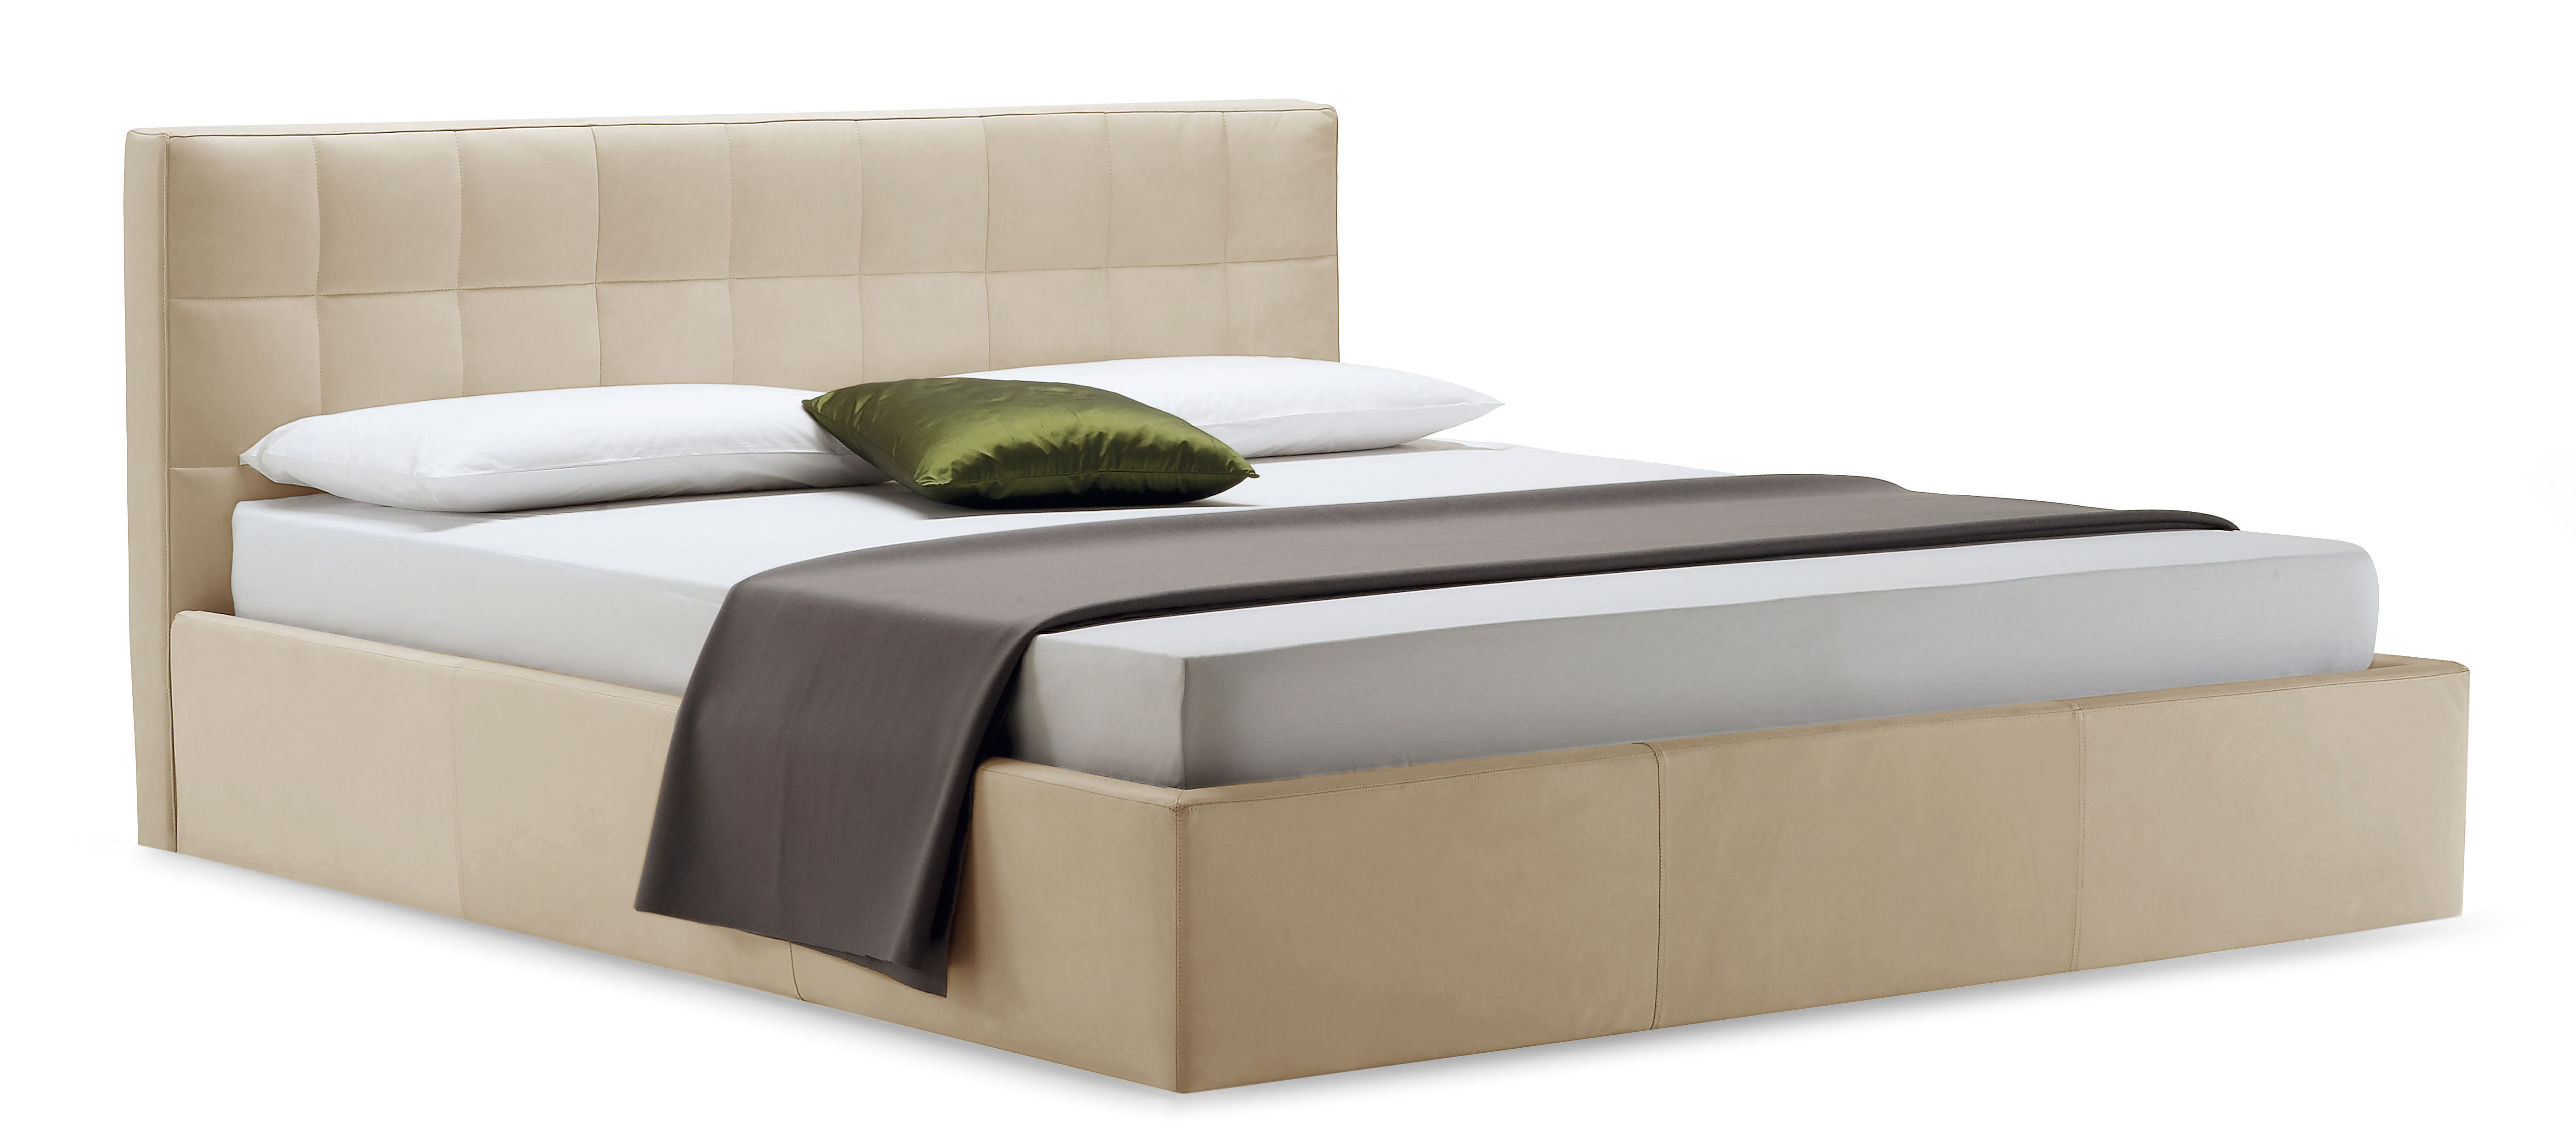 Mobilier - Lits - Lit double Box / 171 x 218 cm - Zanotta - Tissu - Beige chiné - Acier, Tissu